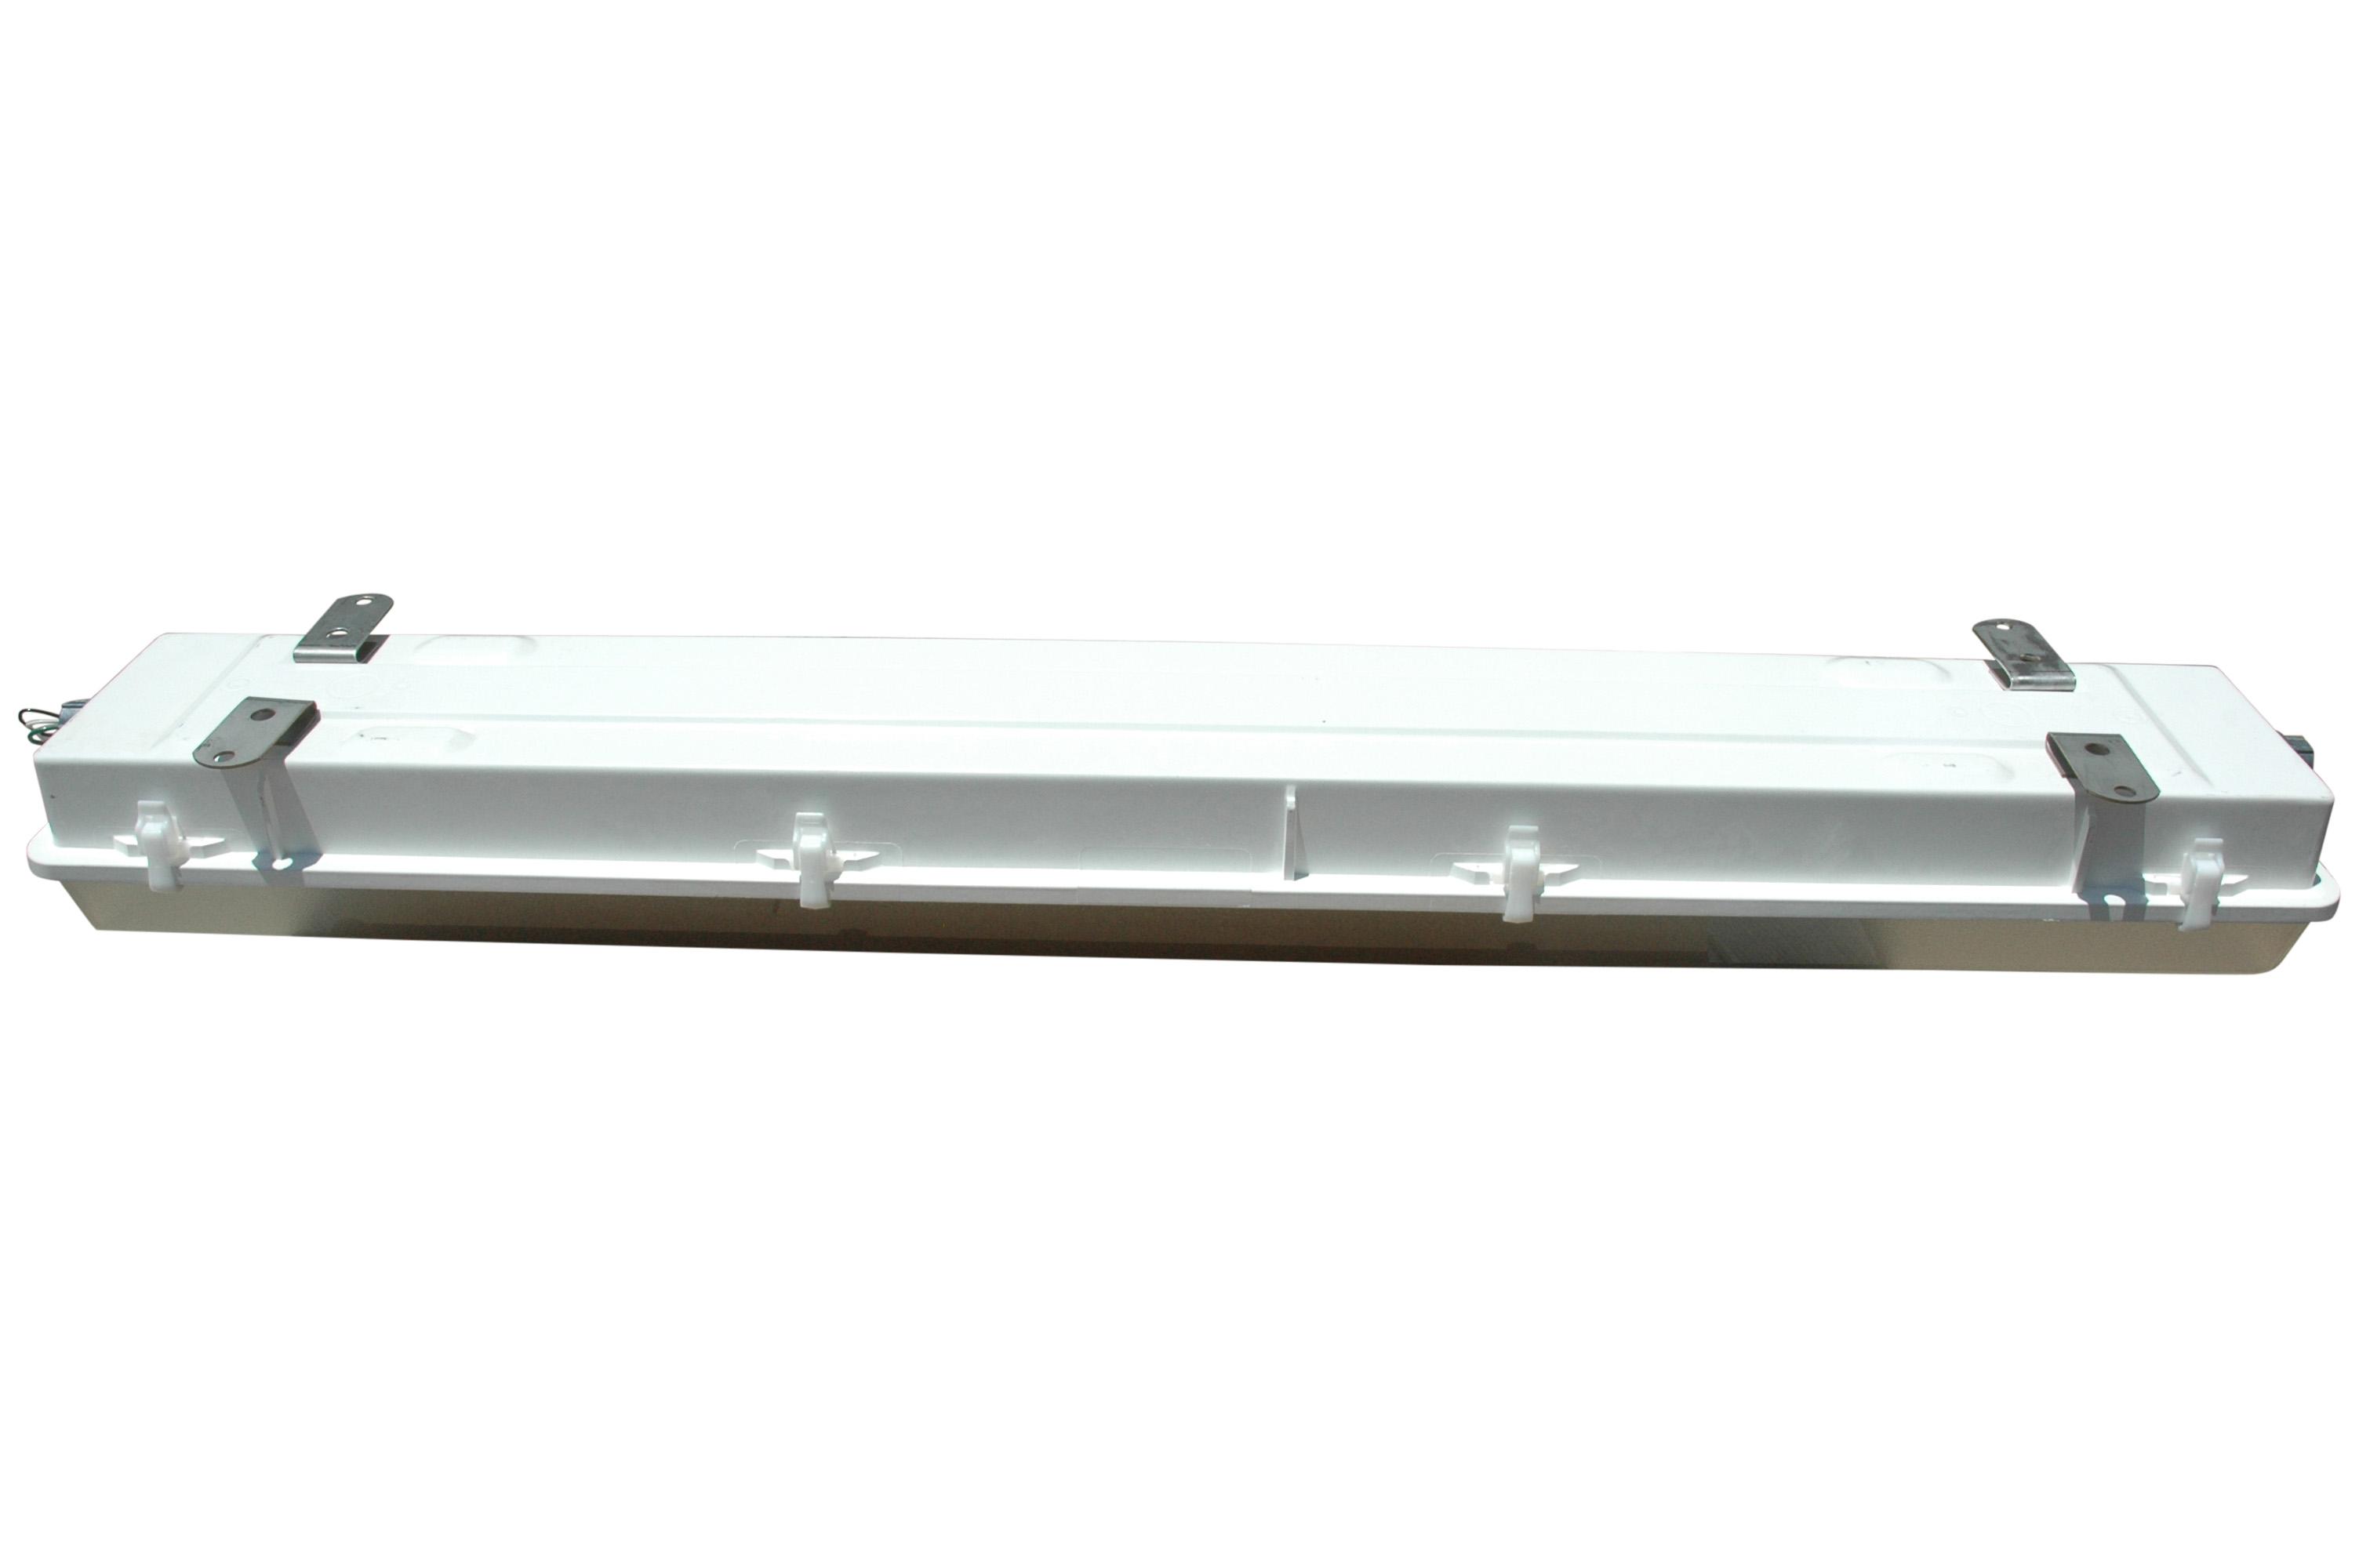 Larson electronics releases a class 1 division 2 fluorescent light class 1 division 2 led light fixture